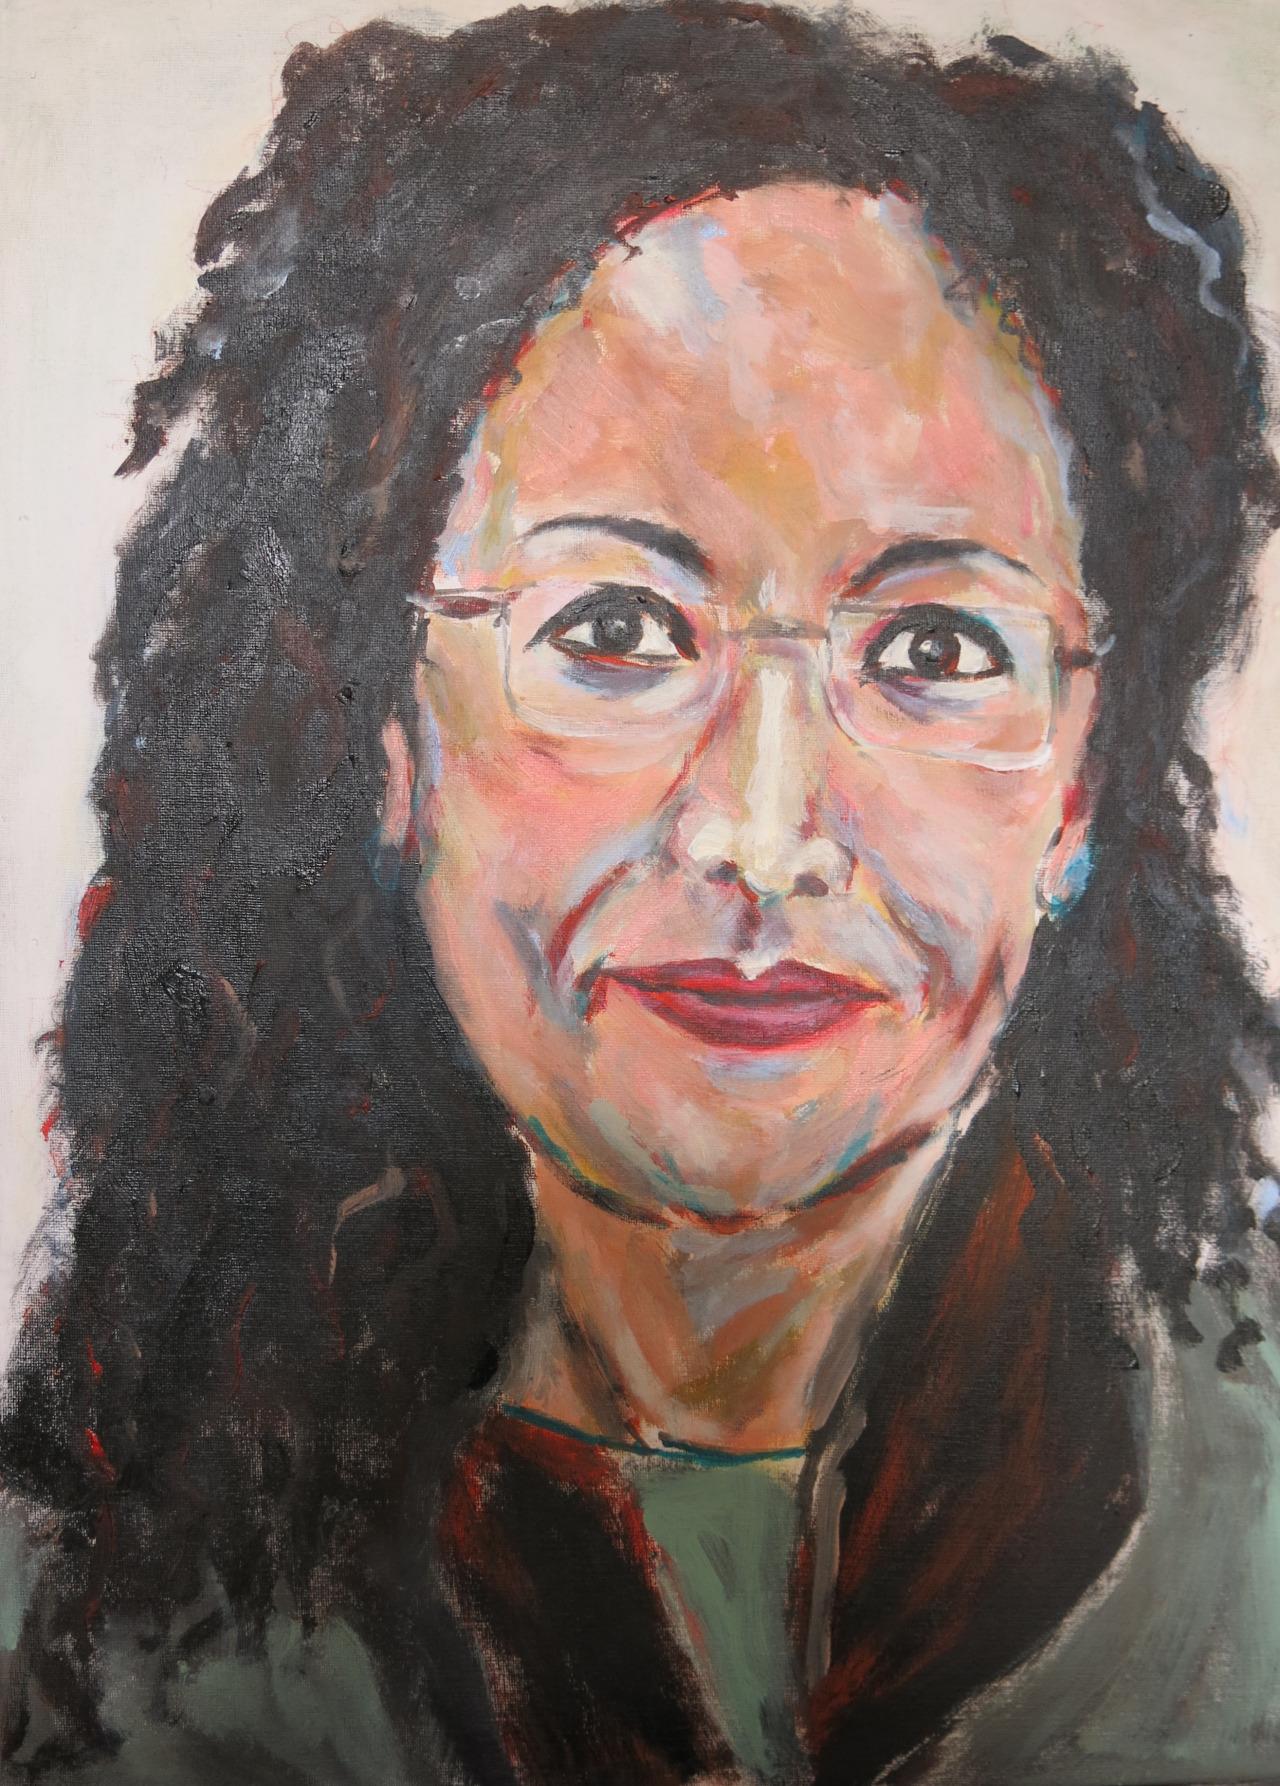 Funzja, Acryl auf Karton, 70x50 cm, 2016